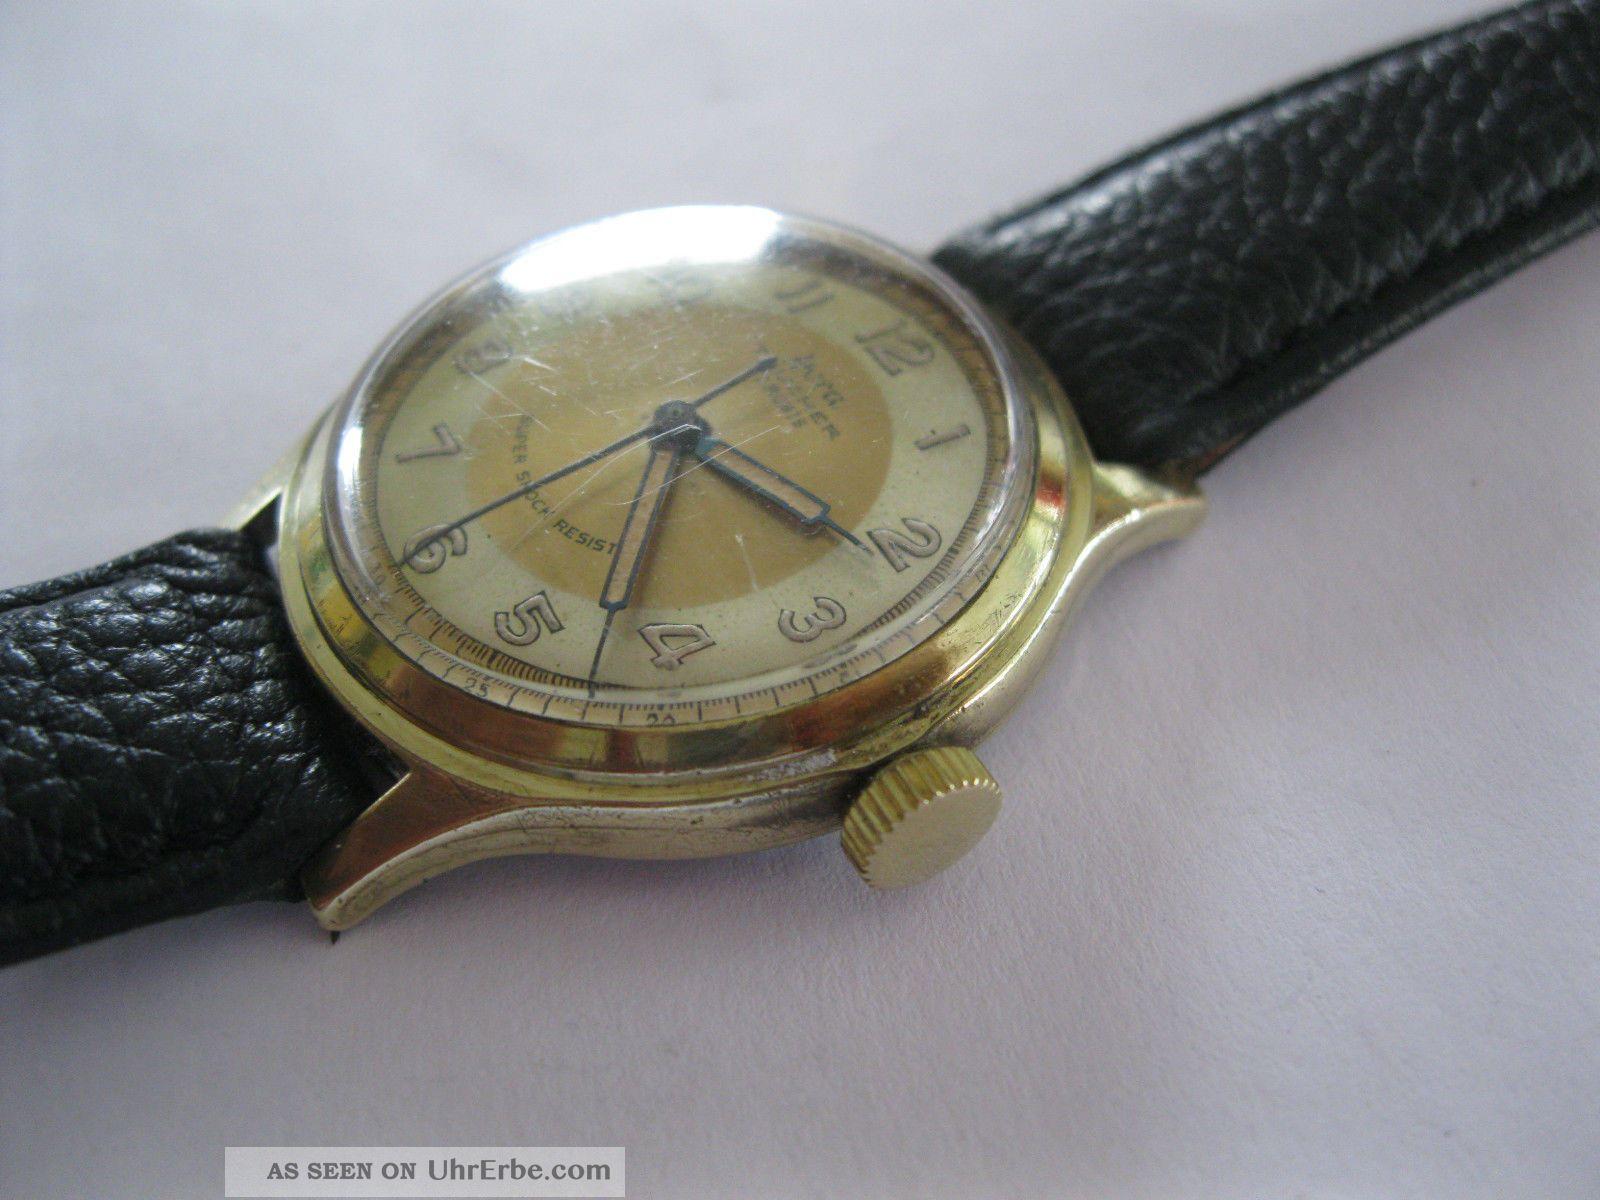 Alte Armbanduhr Hora Taucher 20 Mk Gold 17 Rubis Mech Werk Zifferblatt Goldwei